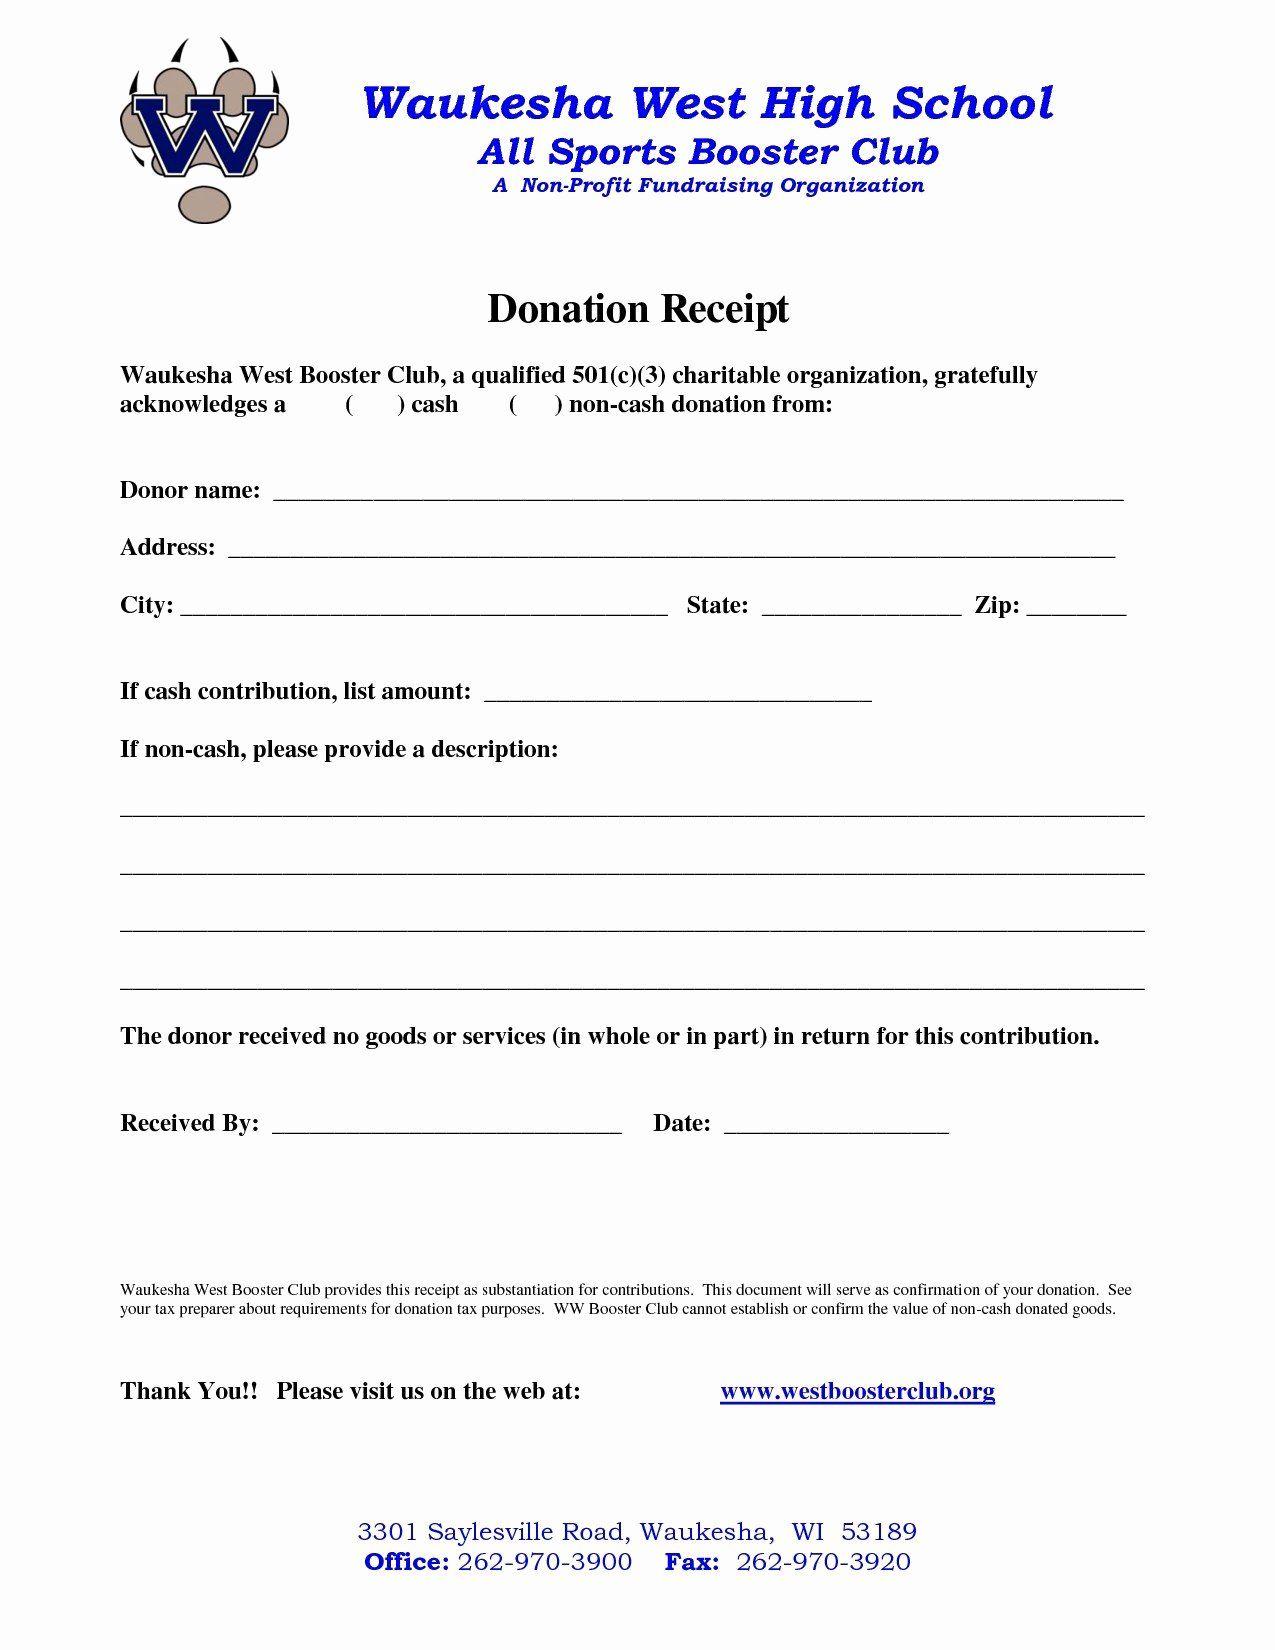 Donation Receipt Letter Template Inspirational Non Profit Donation Receipt Letter Template Examples Receipt Template Donation Letter Template Letter Templates